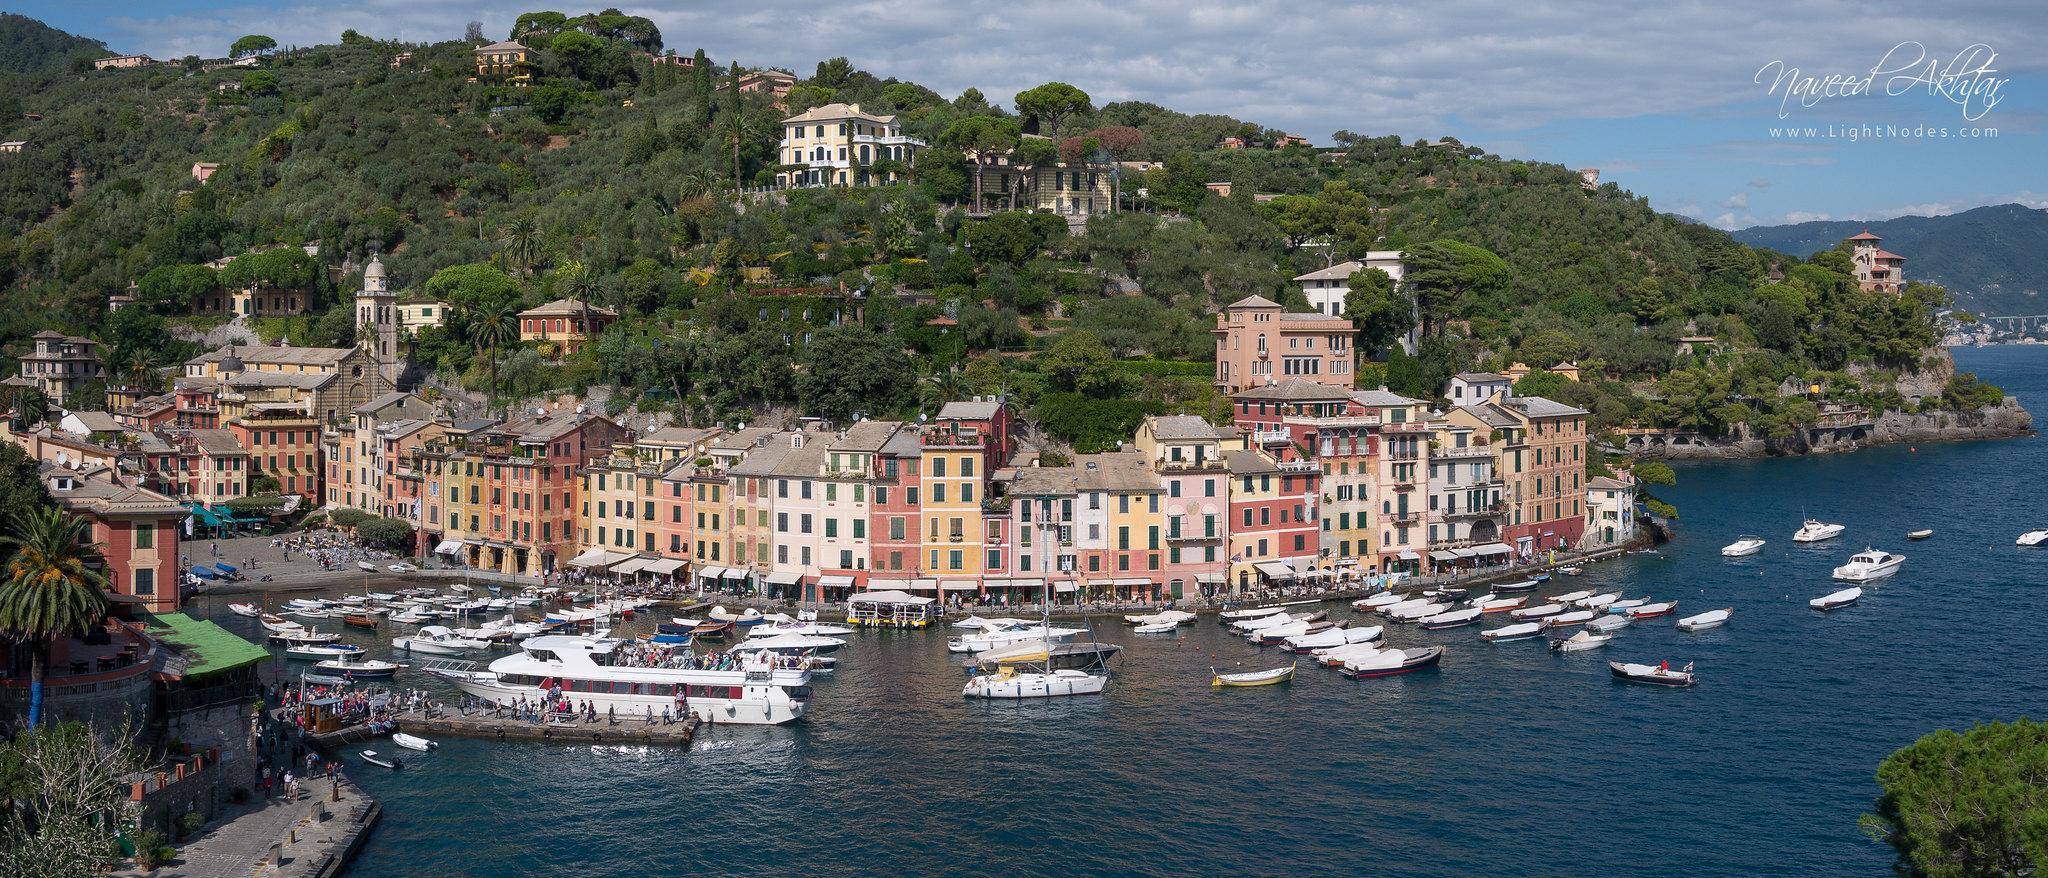 A sunny day in Portofino, Liguria 4K (21:9) with Panasonic DMC-GX7